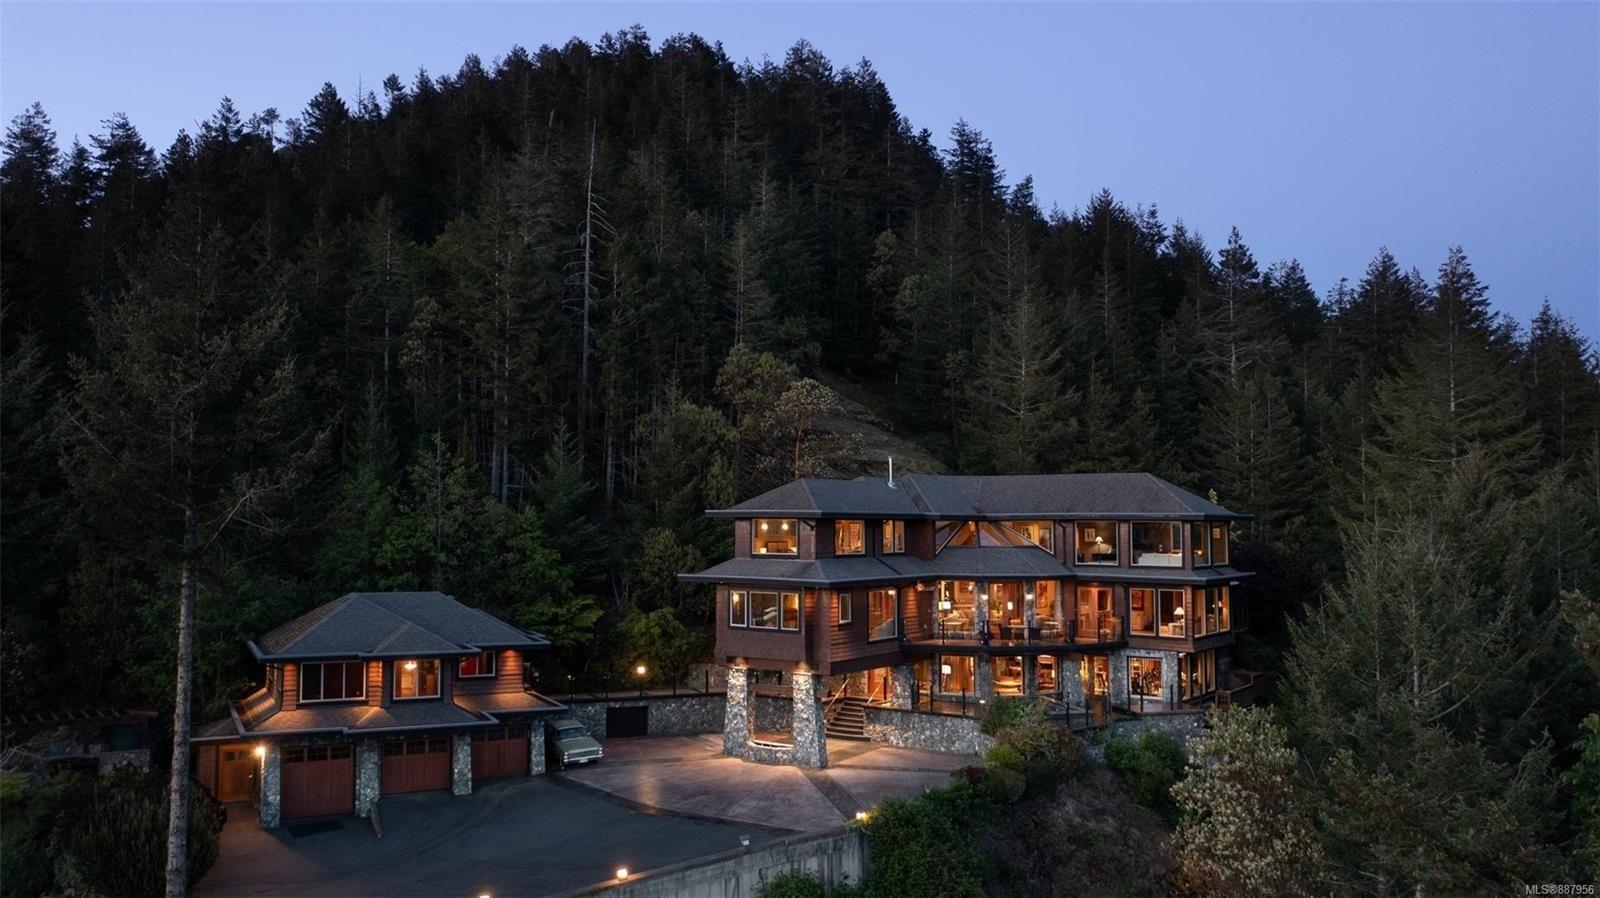 Main Photo: 4948 Nagle Rd in : Sk East Sooke House for sale (Sooke)  : MLS®# 887956